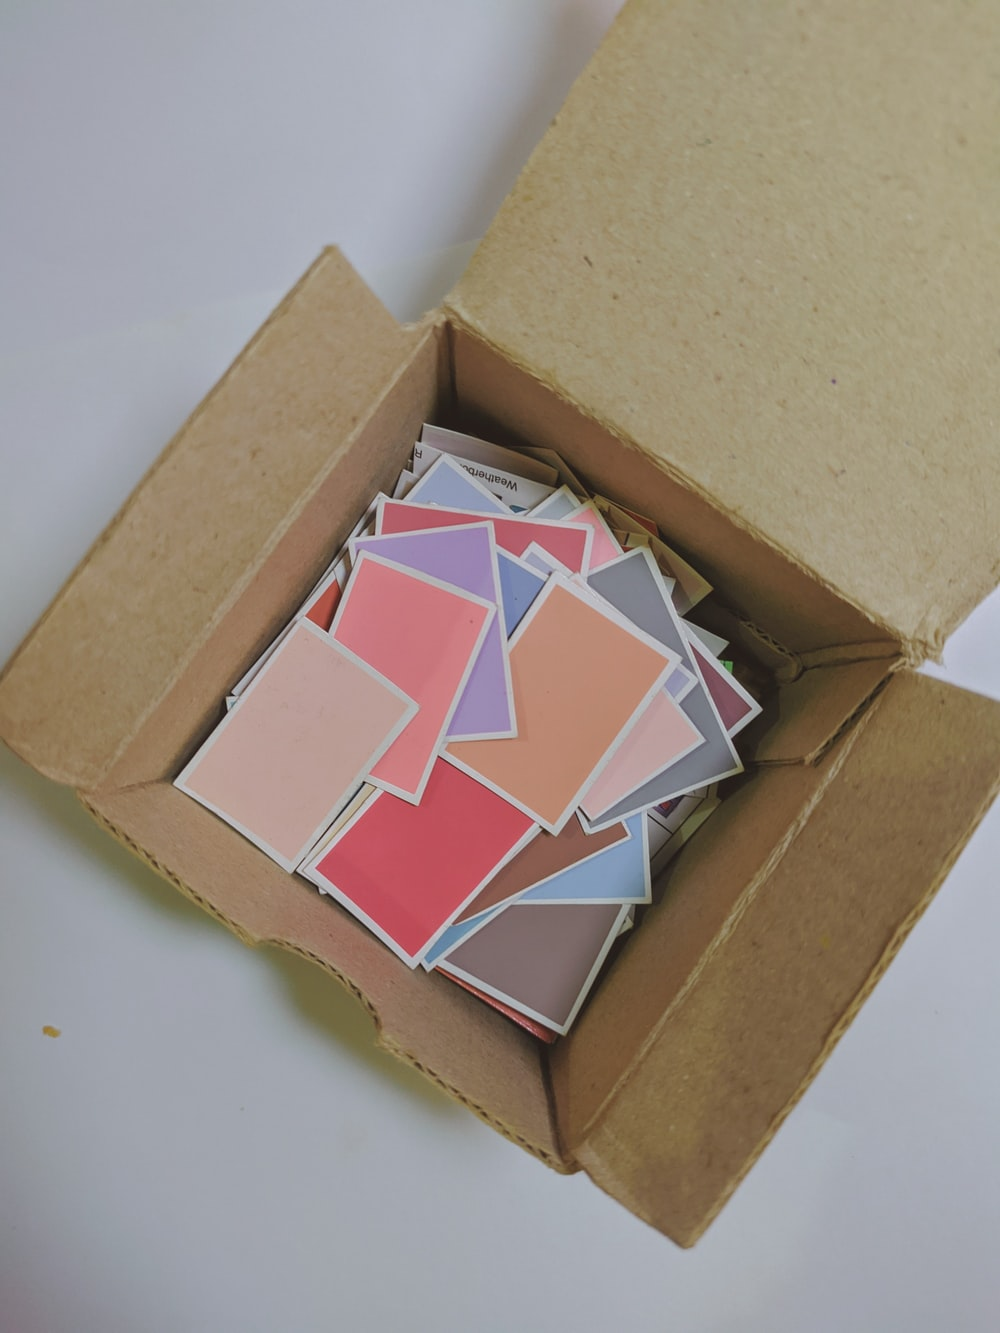 brown cardboard box on white surface